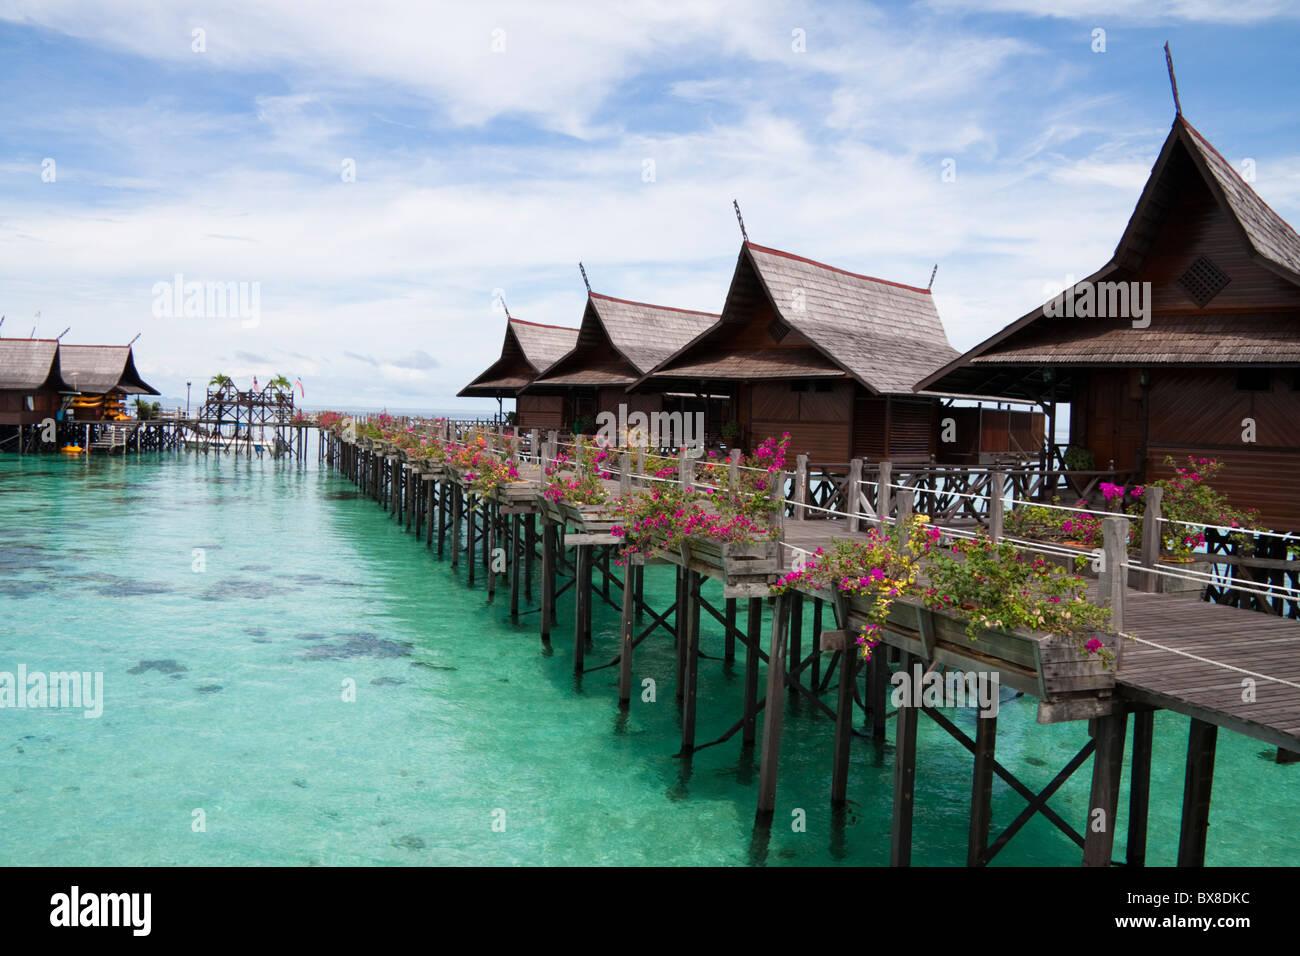 Water bungalows sipadan kapalai dive holiday resort ligitan stock photo royalty free image - Kapalai sipadan dive resort ...